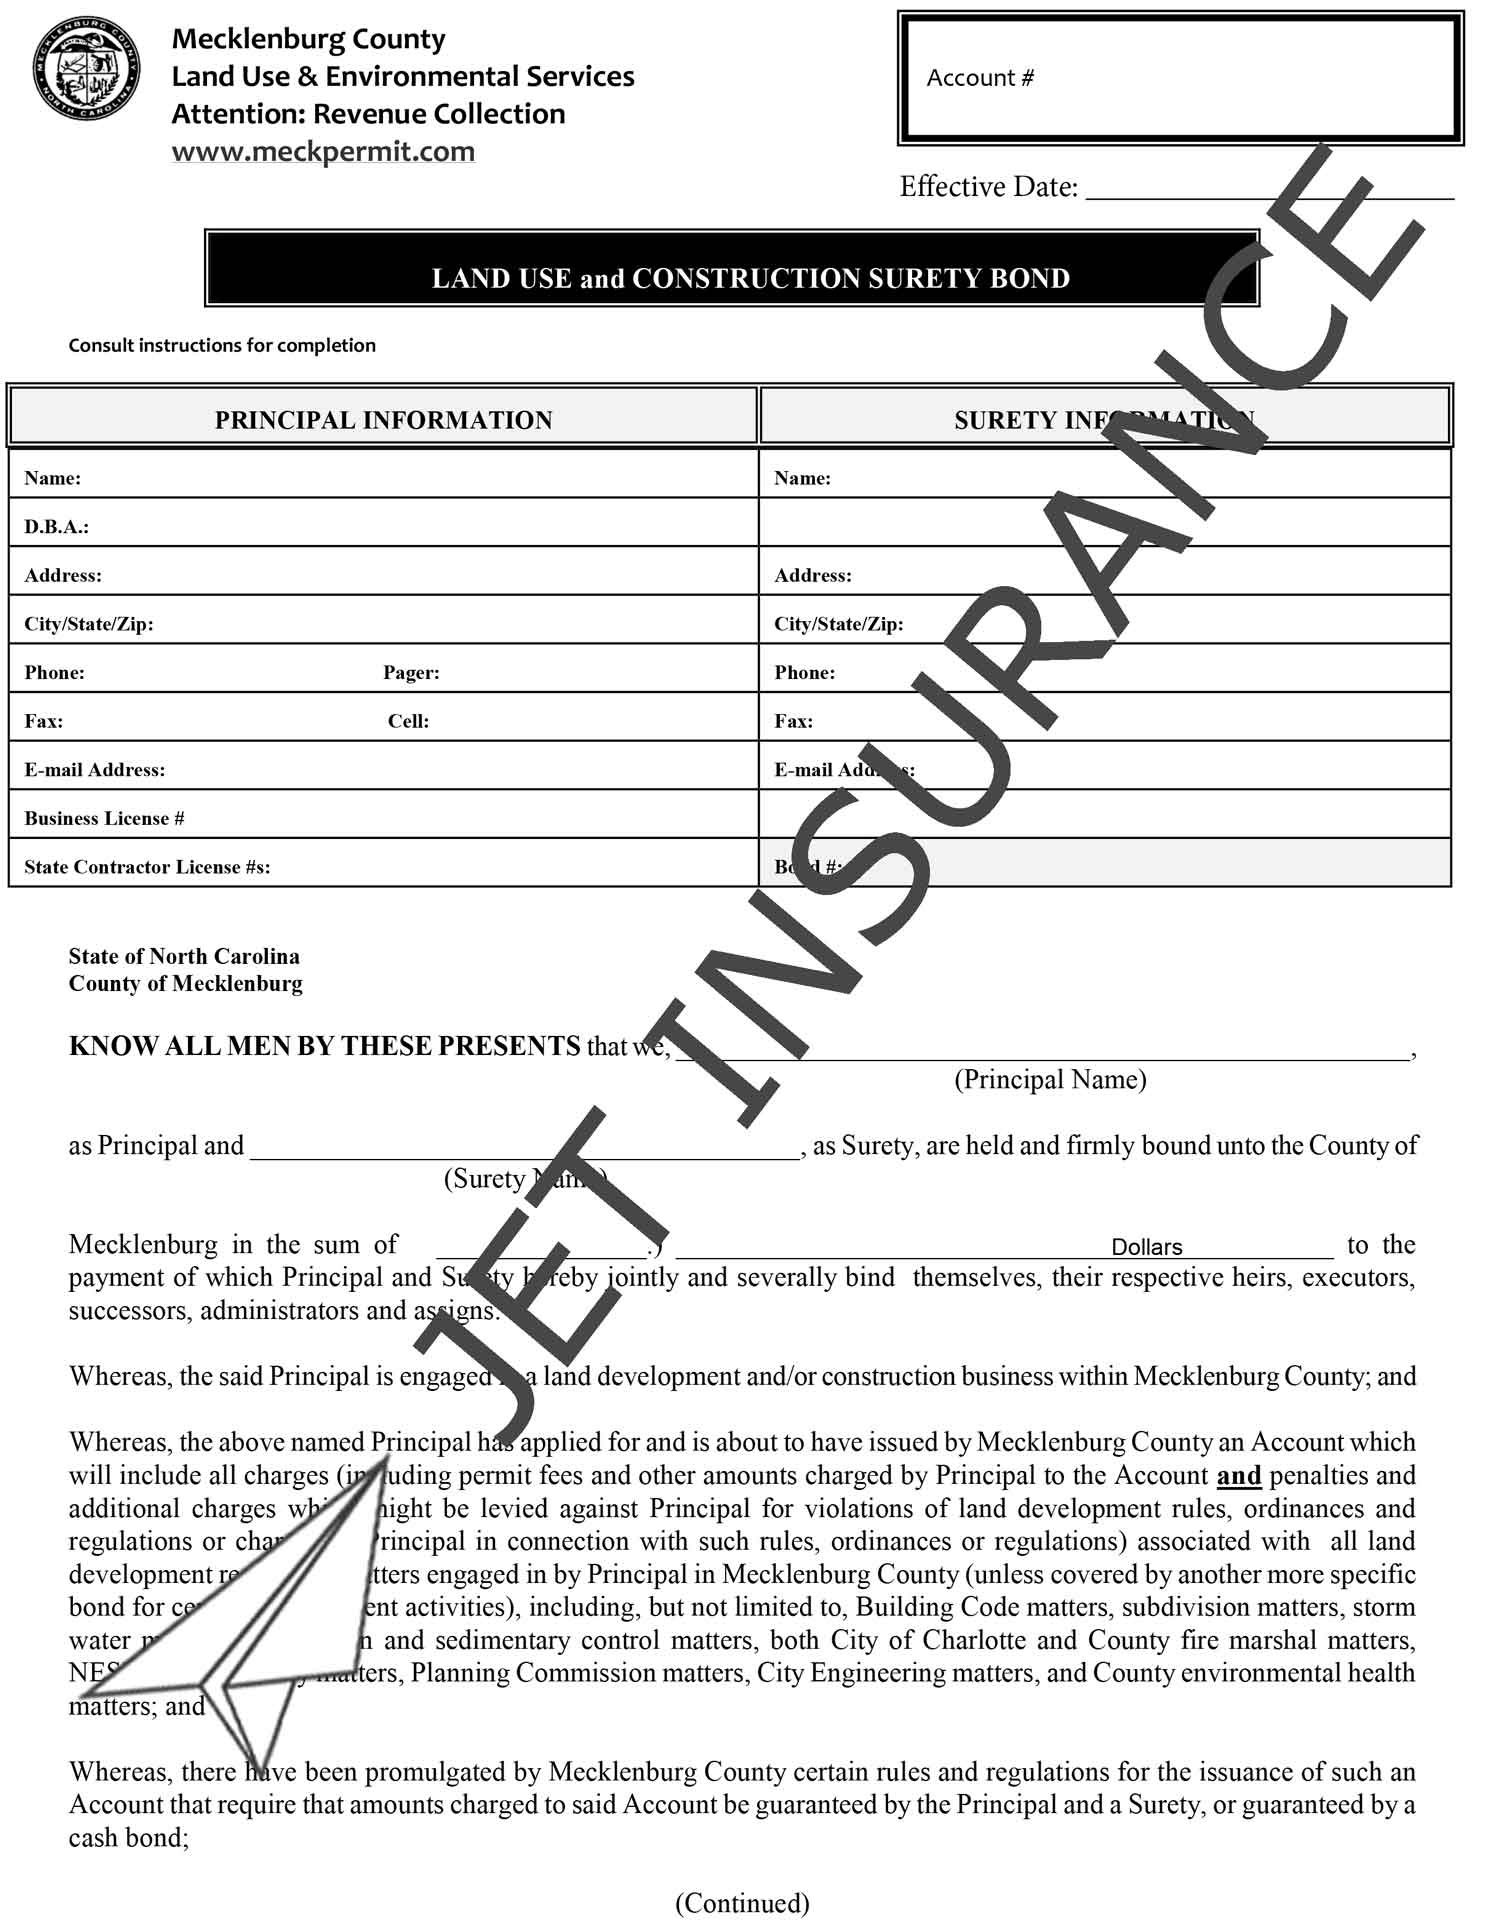 Mecklenburg County North Carolina Land Use and Construction Bond Form